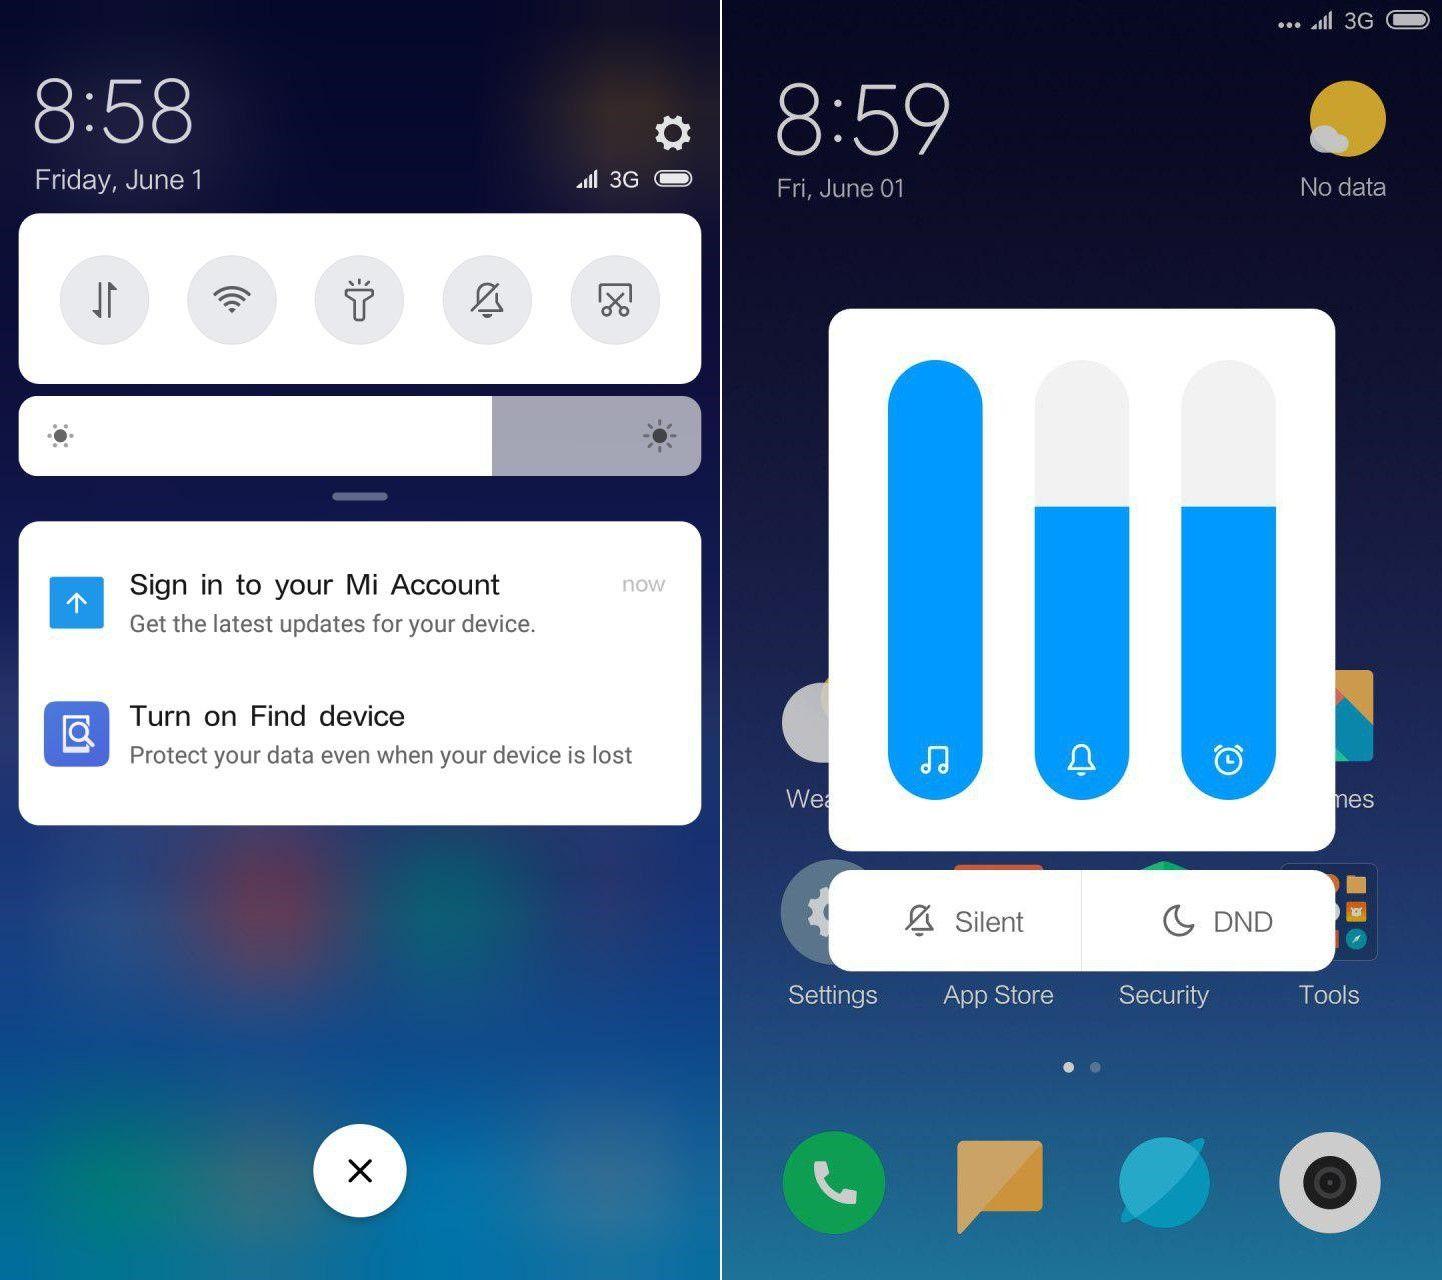 MIUI 10 de Xiaomi Différences entre Mi, Redmi et Pocophone : Quel Xiaomi choisir ?